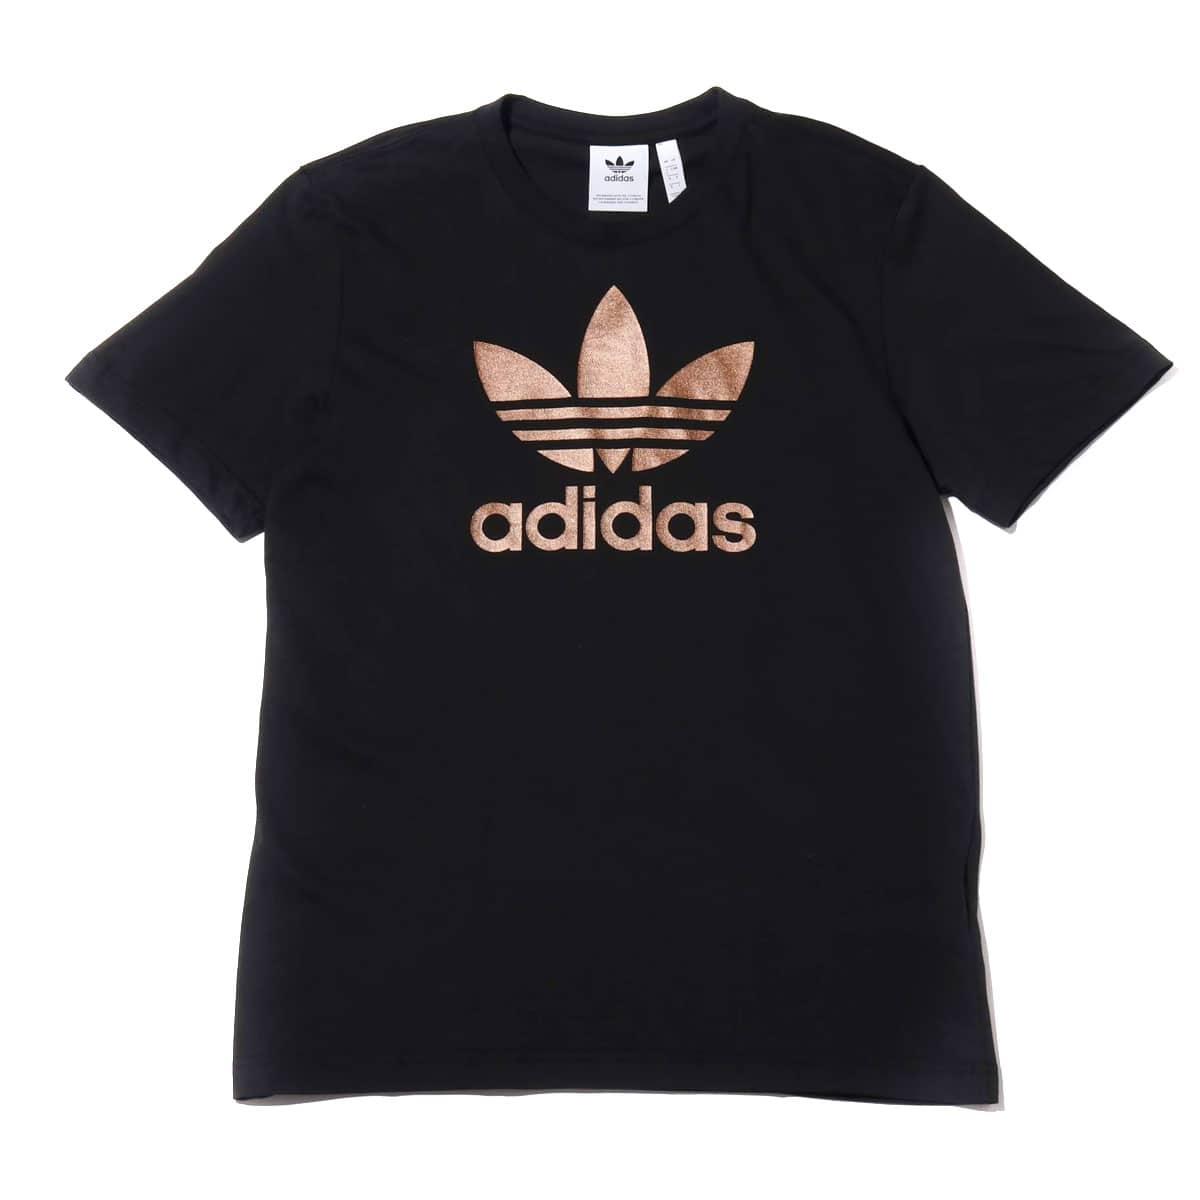 adidas TREFOIL TEE BLACK 19FW-I_photo_large